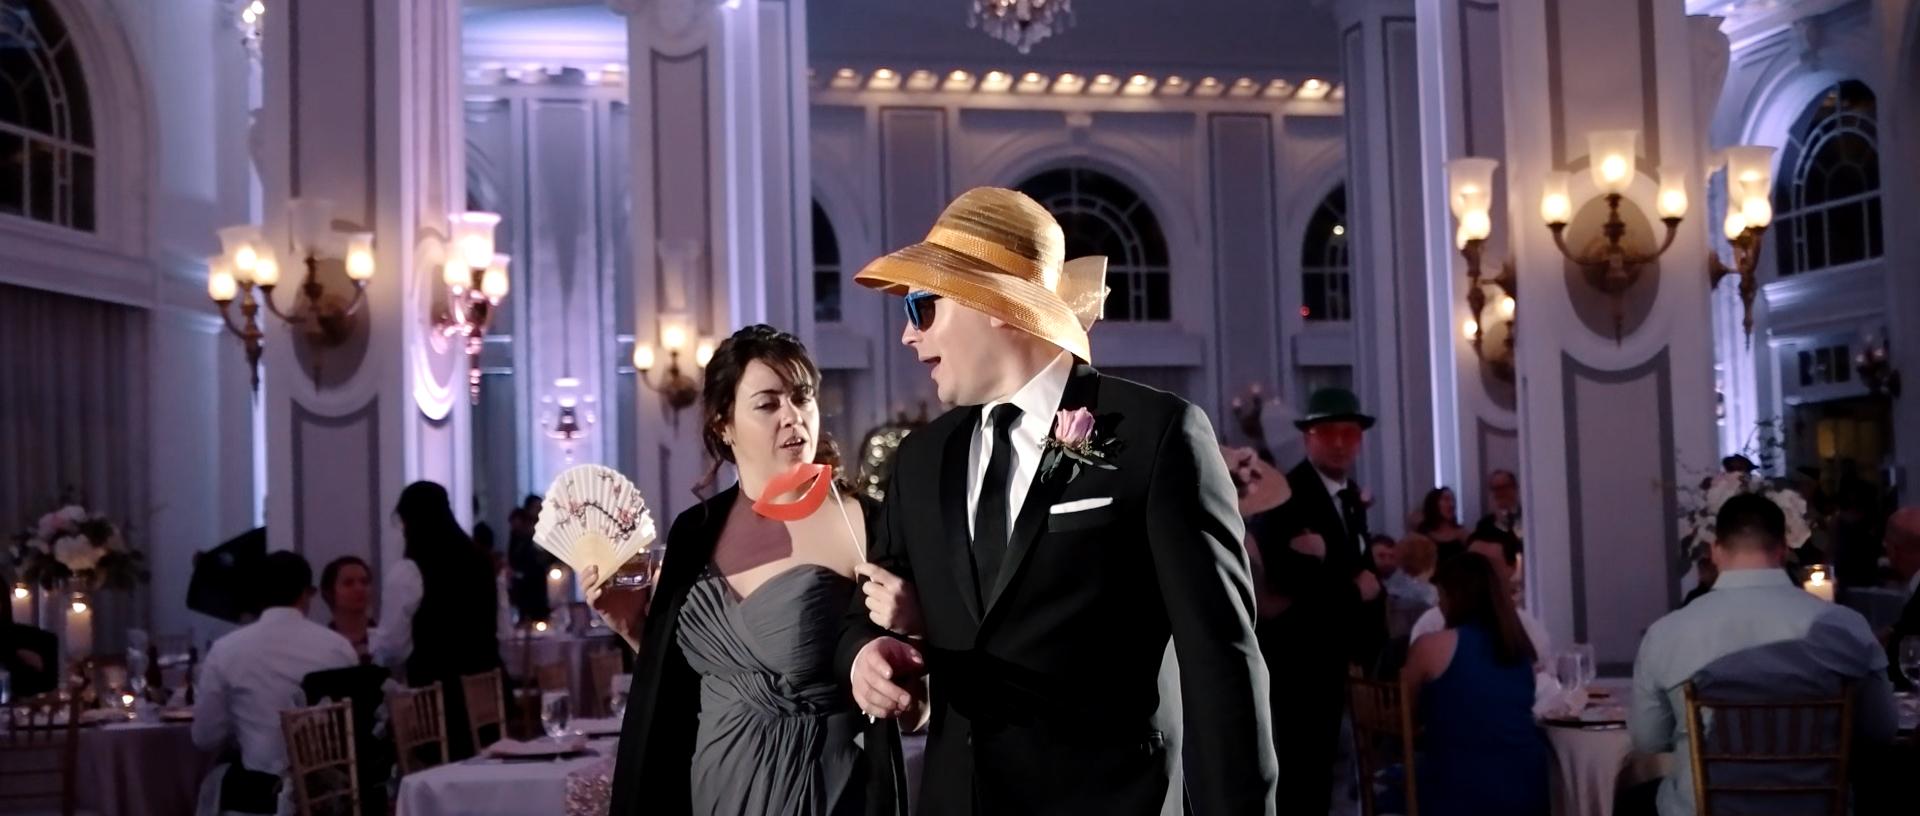 Atlanta Wedding Videographer0019.jpg